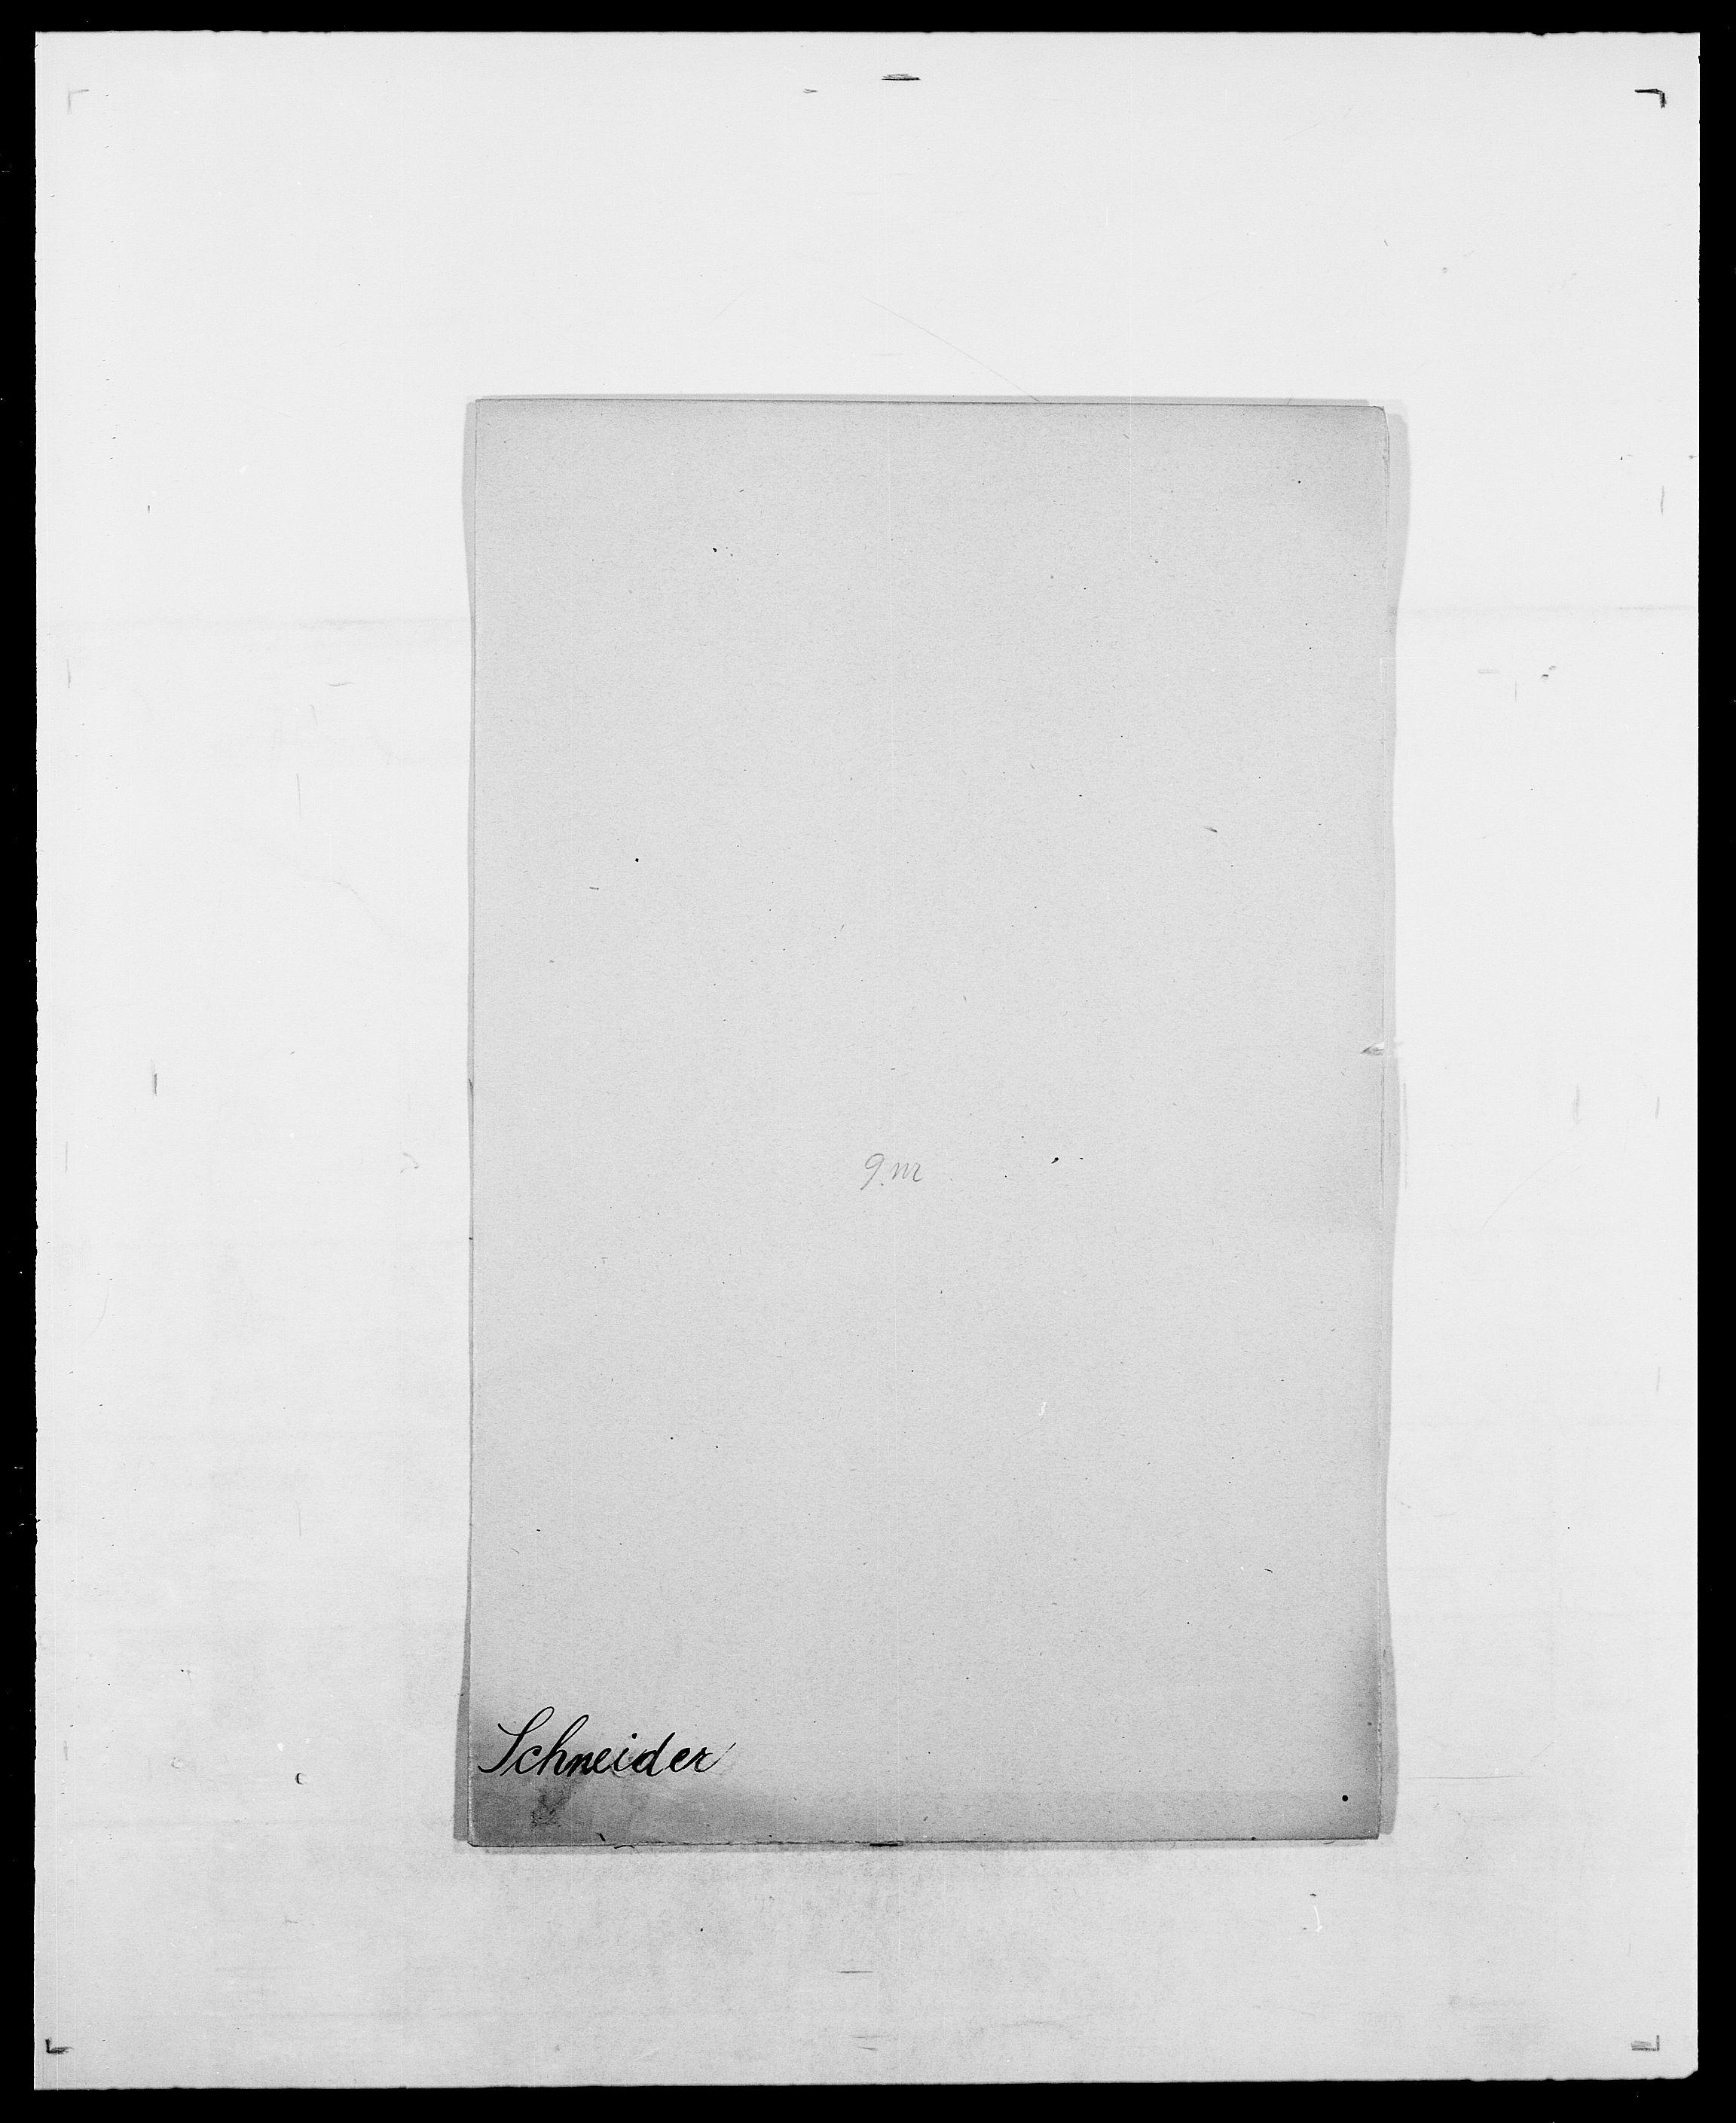 SAO, Delgobe, Charles Antoine - samling, D/Da/L0035: Schnabel - sjetman, s. 6